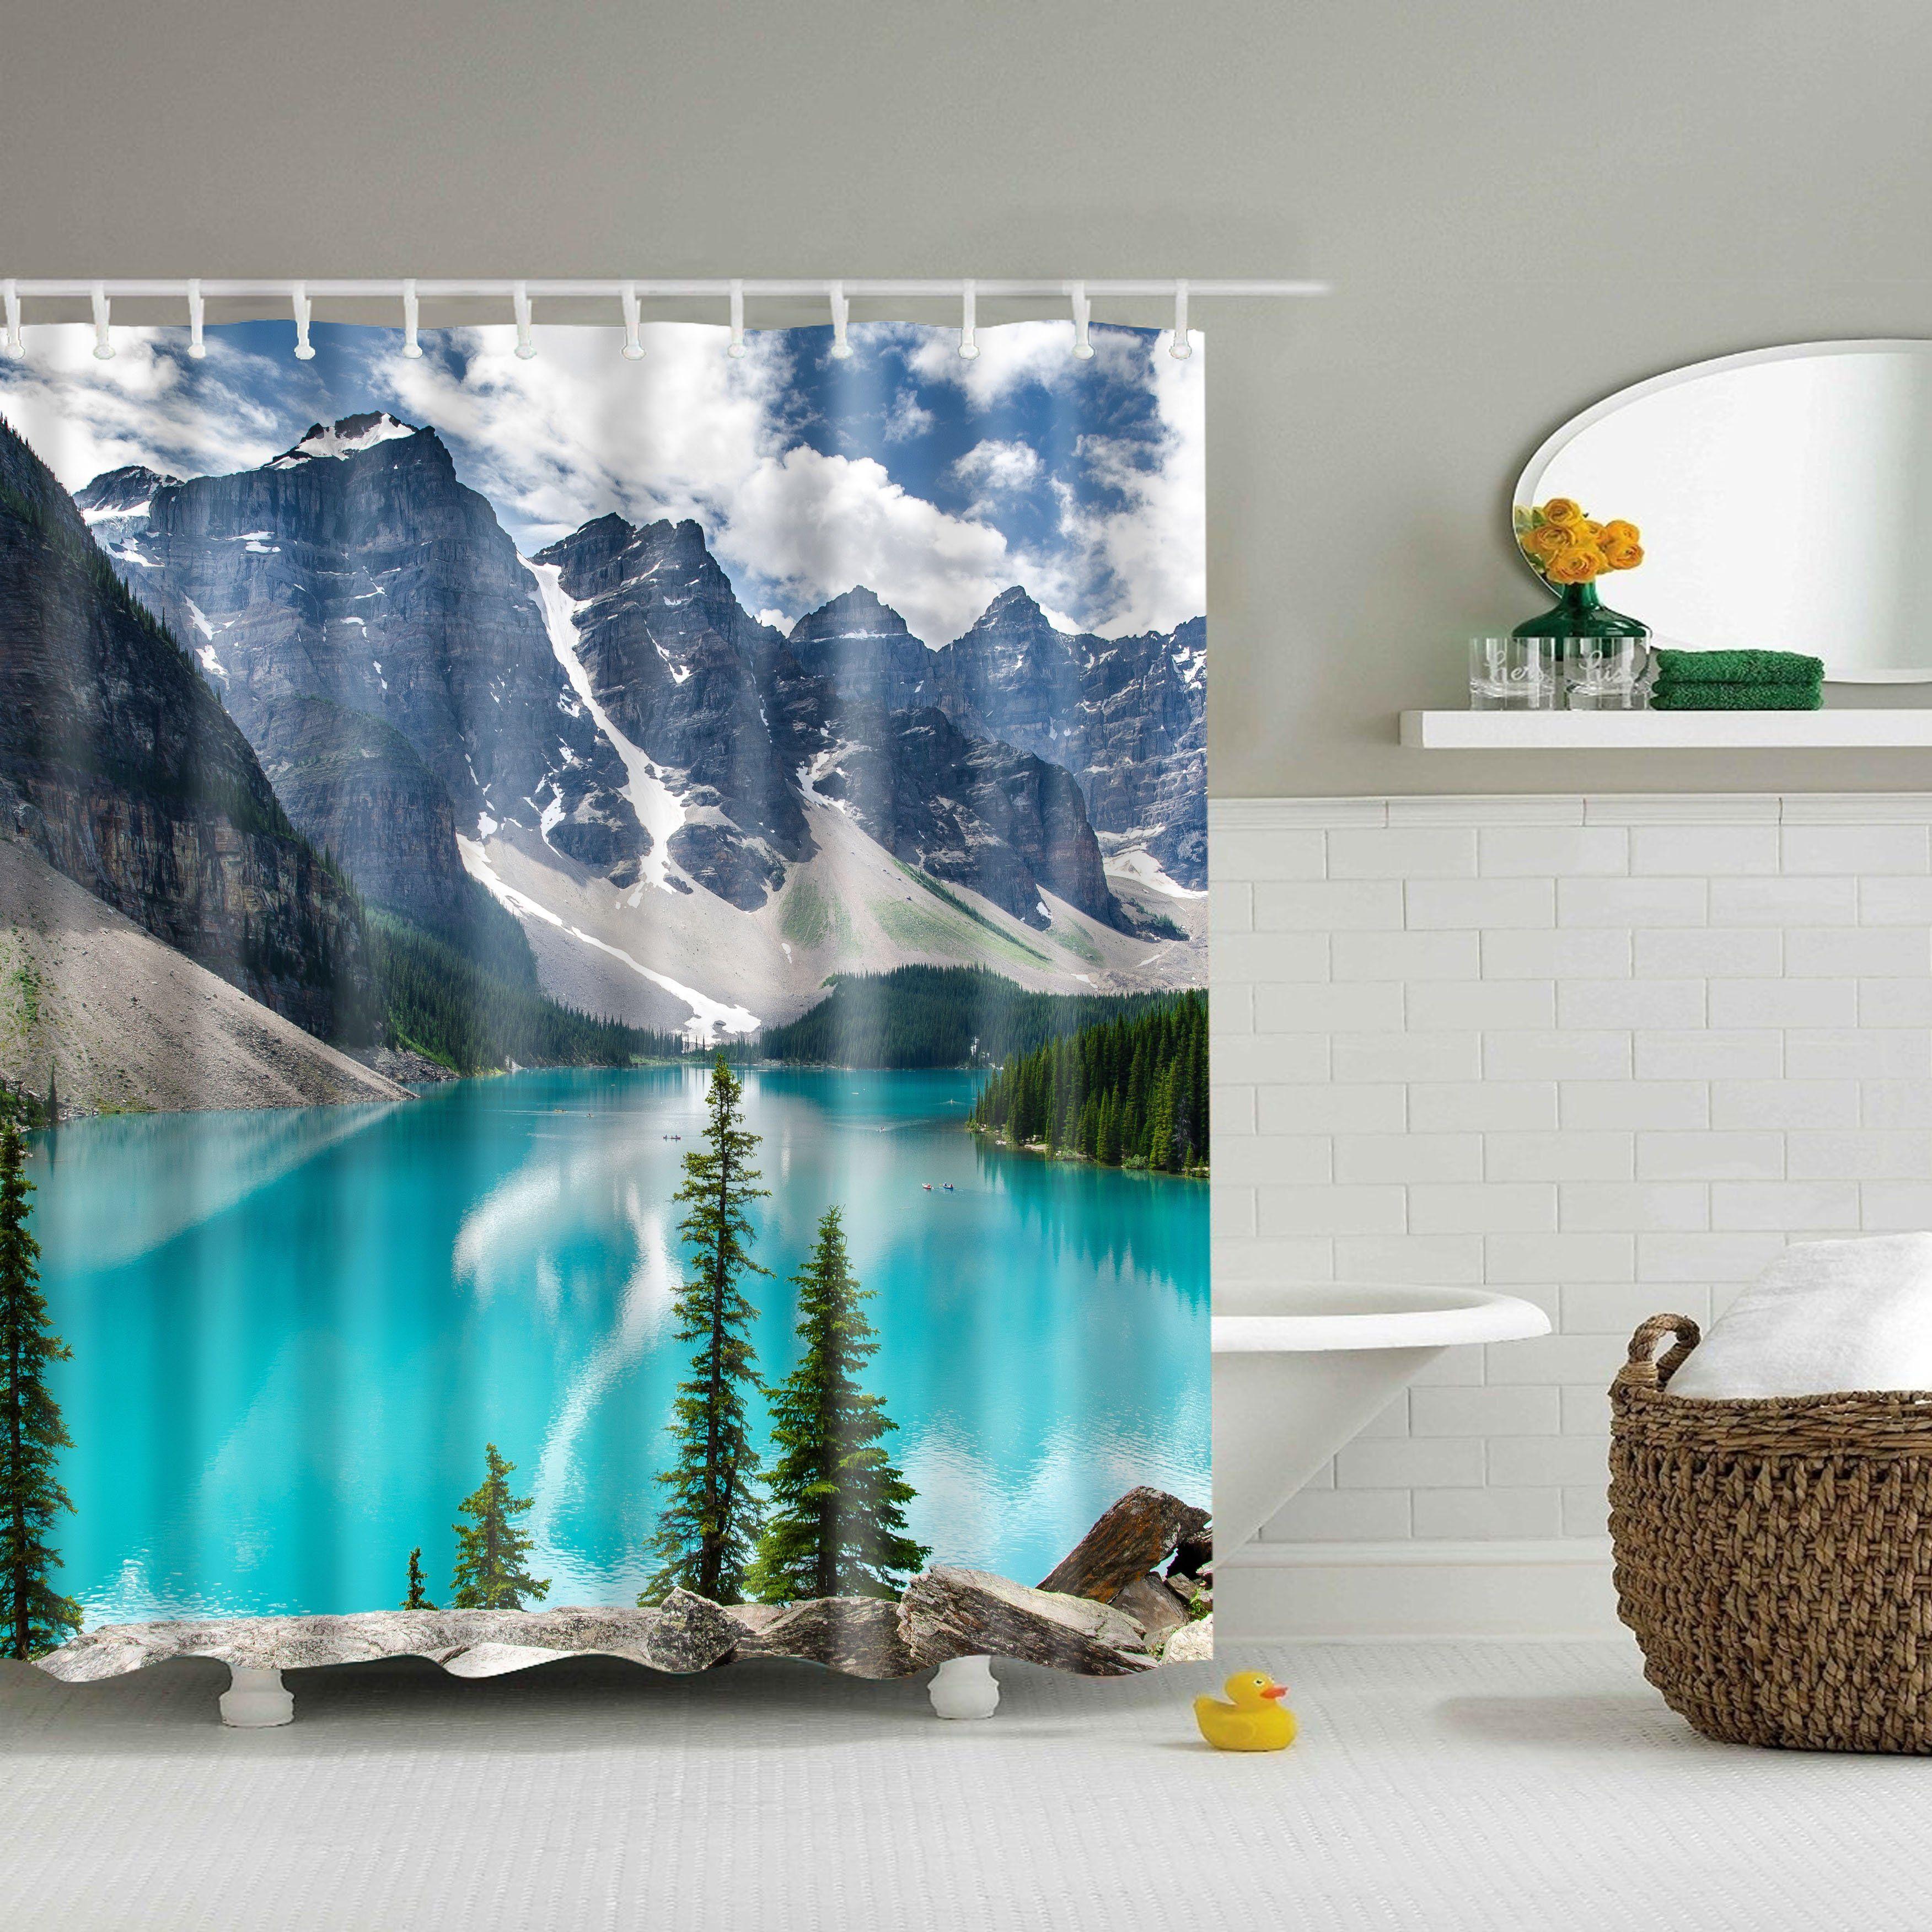 Beautiful Nature Mountain Lake Themed Shower Curtain Bathroom Decor Fabric Shower Curtains Shower Curtain Art Bathroom Shower Curtains